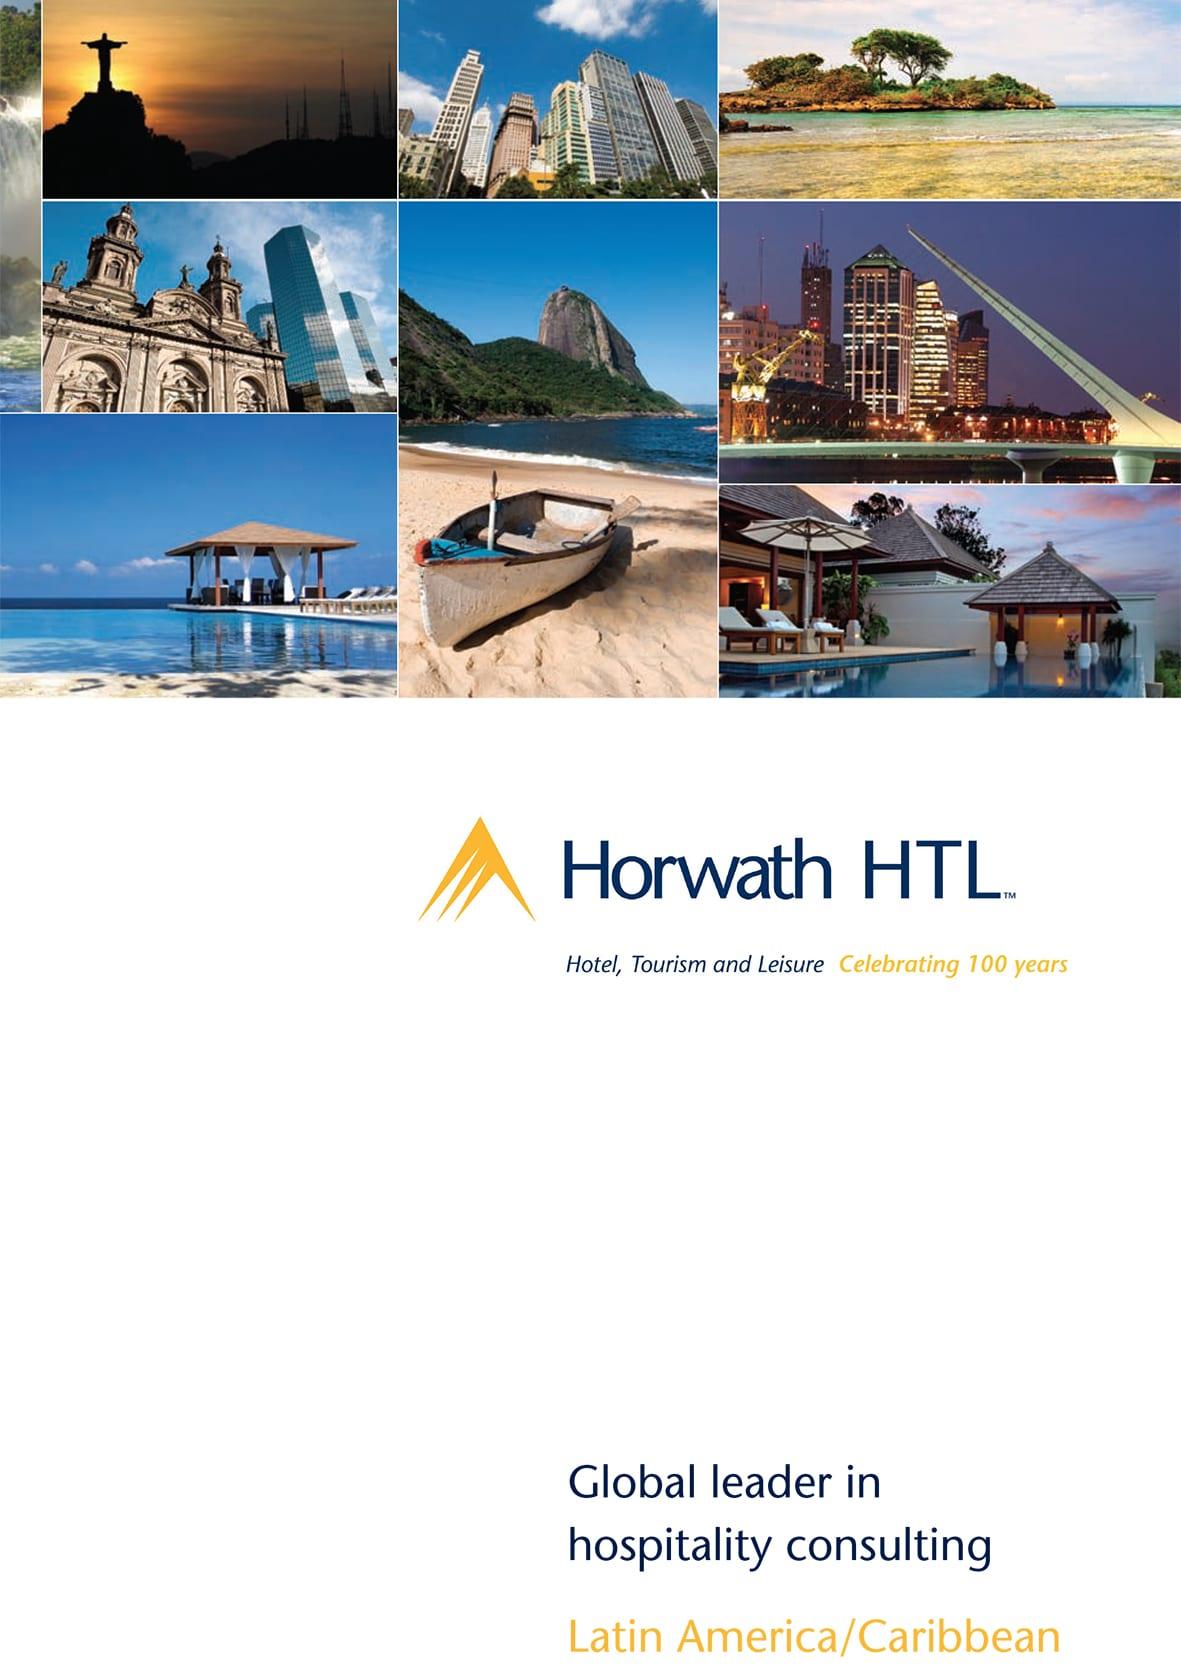 HorwathHTL LAC231015 4 1